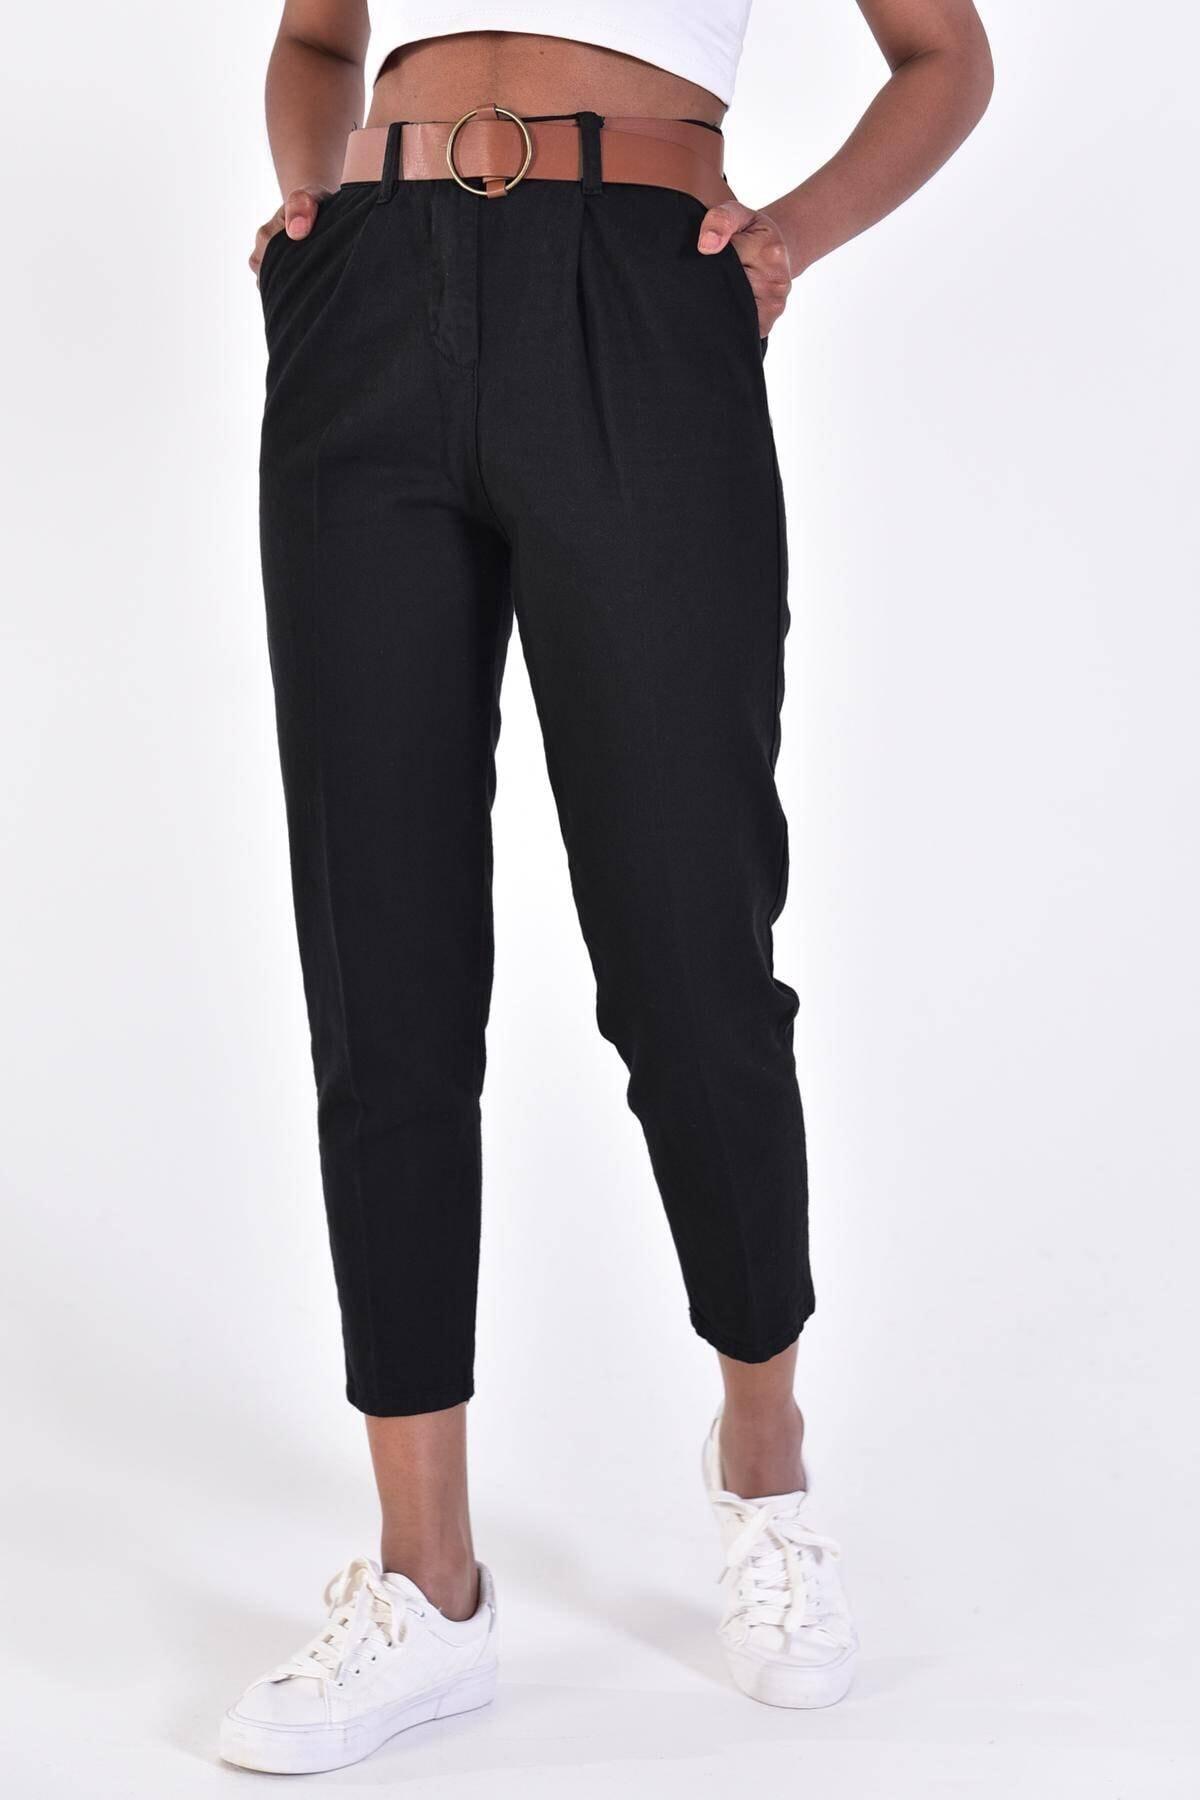 Addax Kadın Siyah Kemerli Pantolon PN4204 - DK1 ADX-0000020952